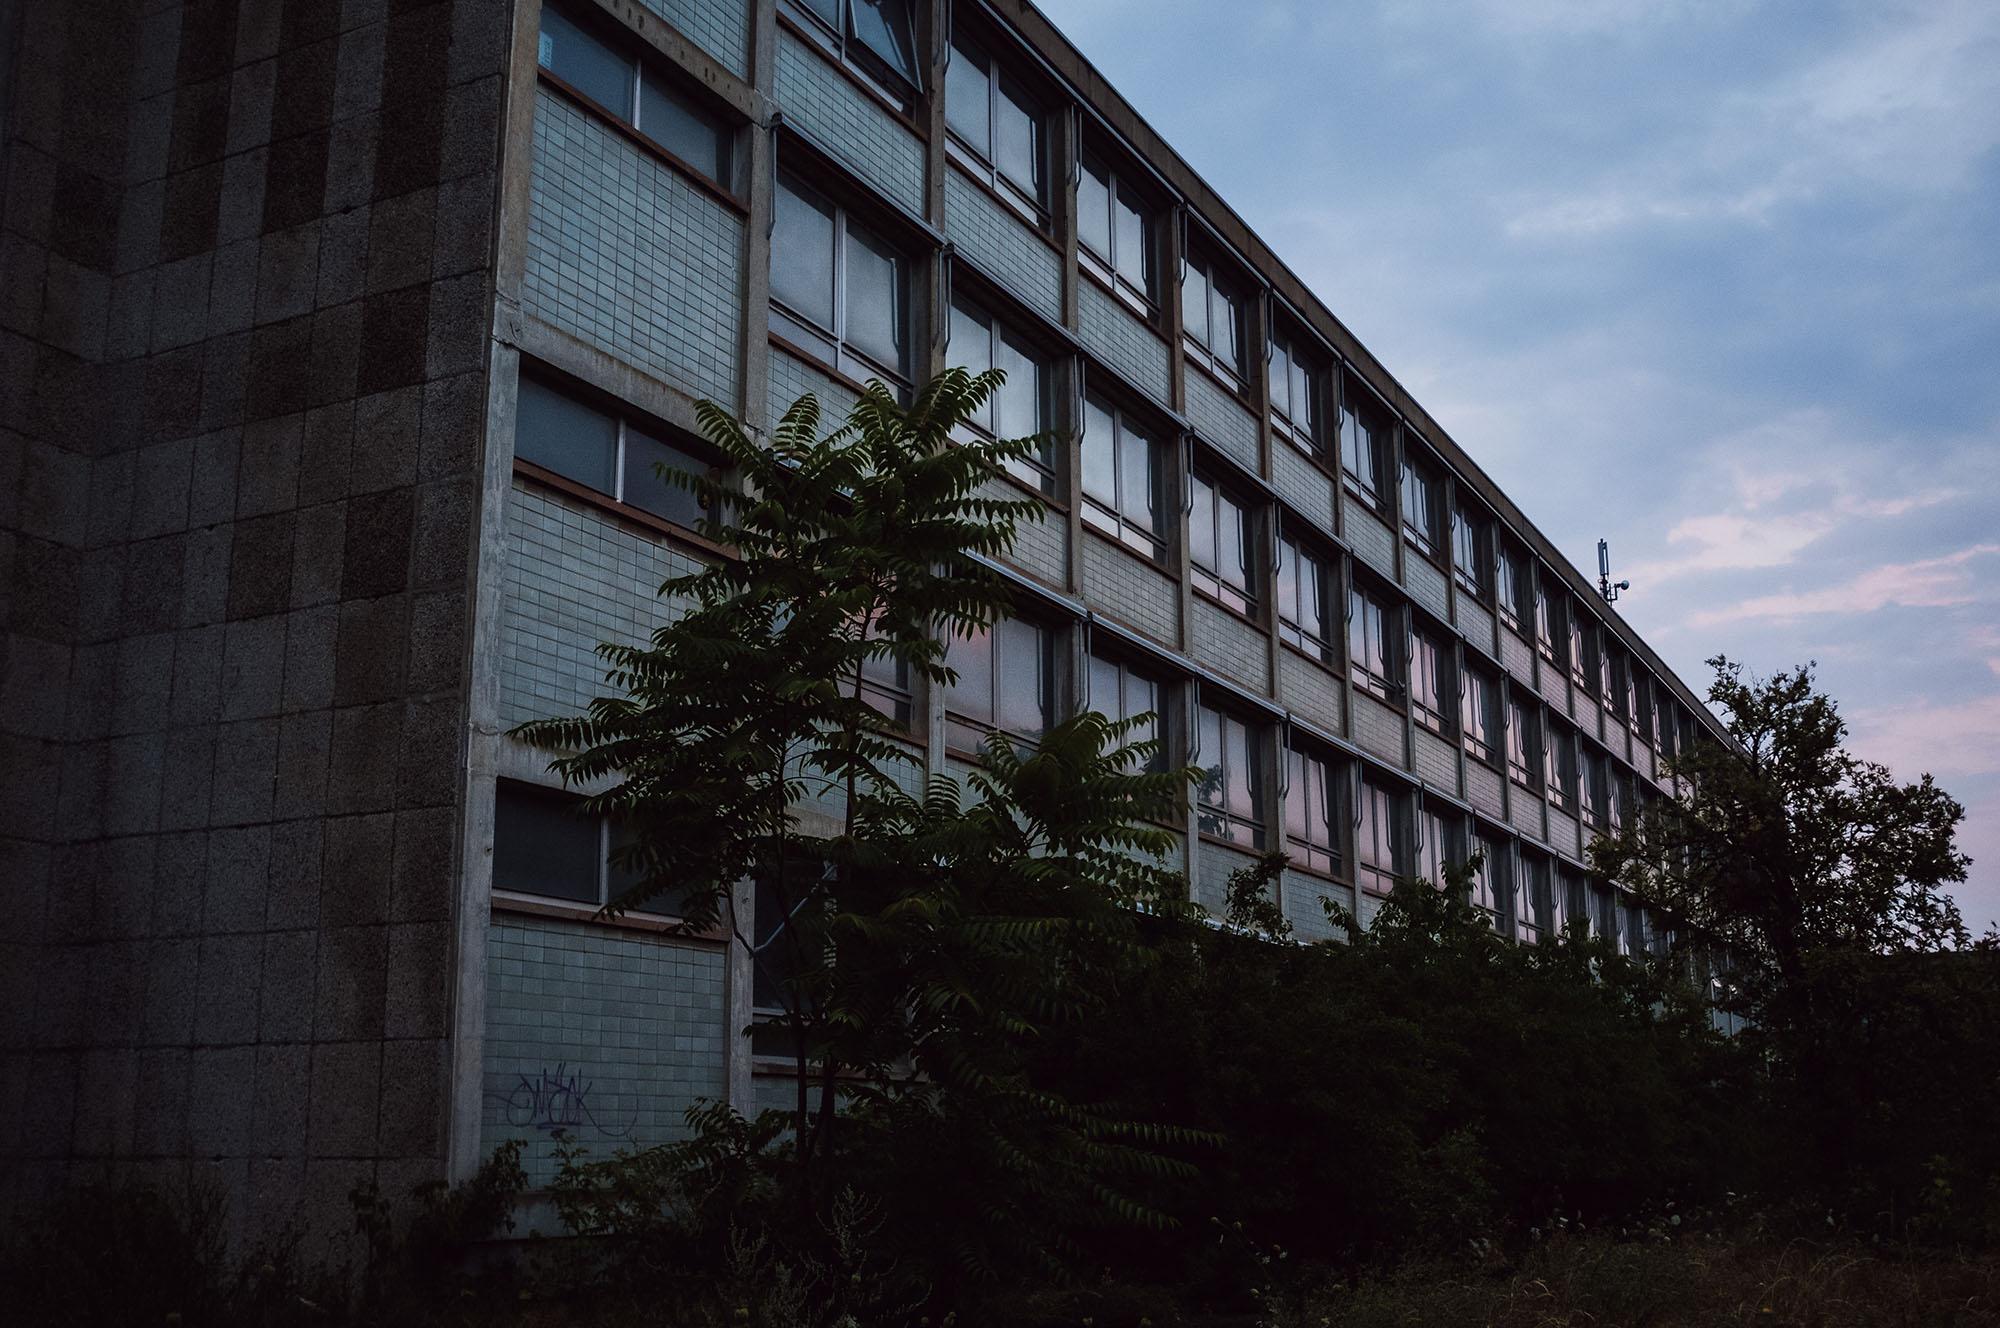 documenting leipzig old school abandoned